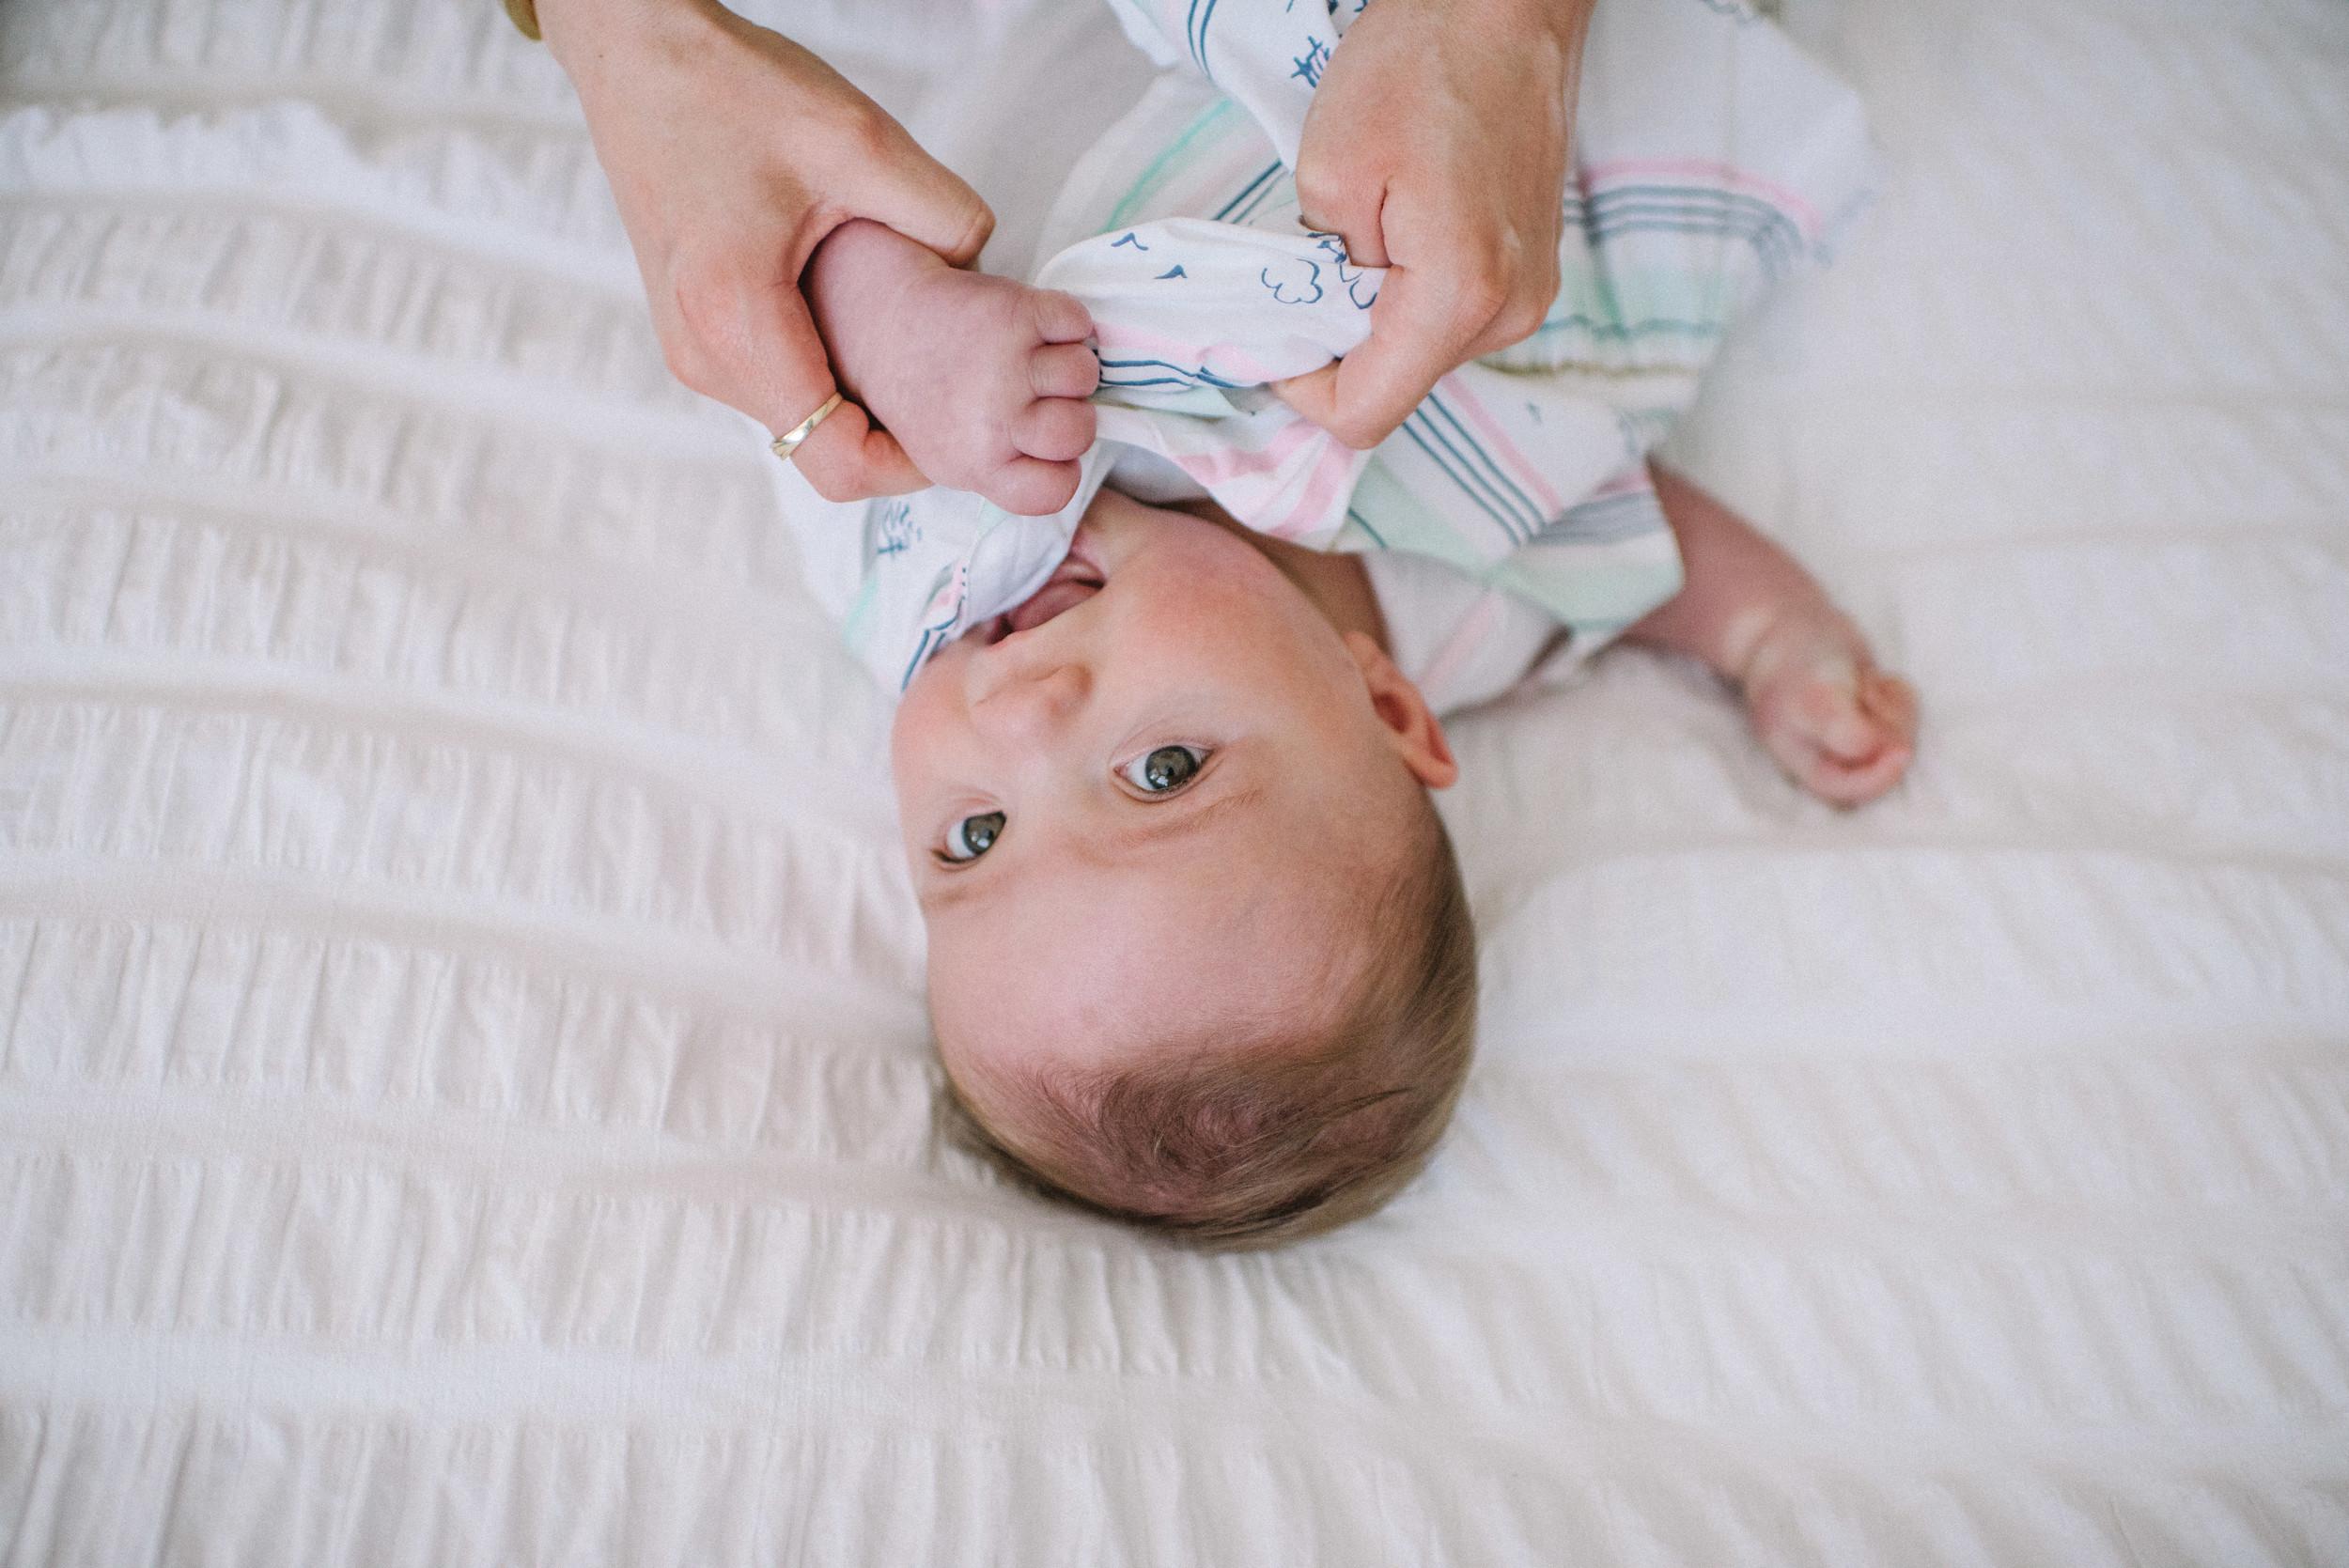 0032-ALTERNATIVE-WEDDING-PHOTOGRAPHER-GLASGOW-FAMILY-PHOTOGRAPHER-KIDS-PORTRAITS-BABY-PORTRAITS-GLASGOW.JPG